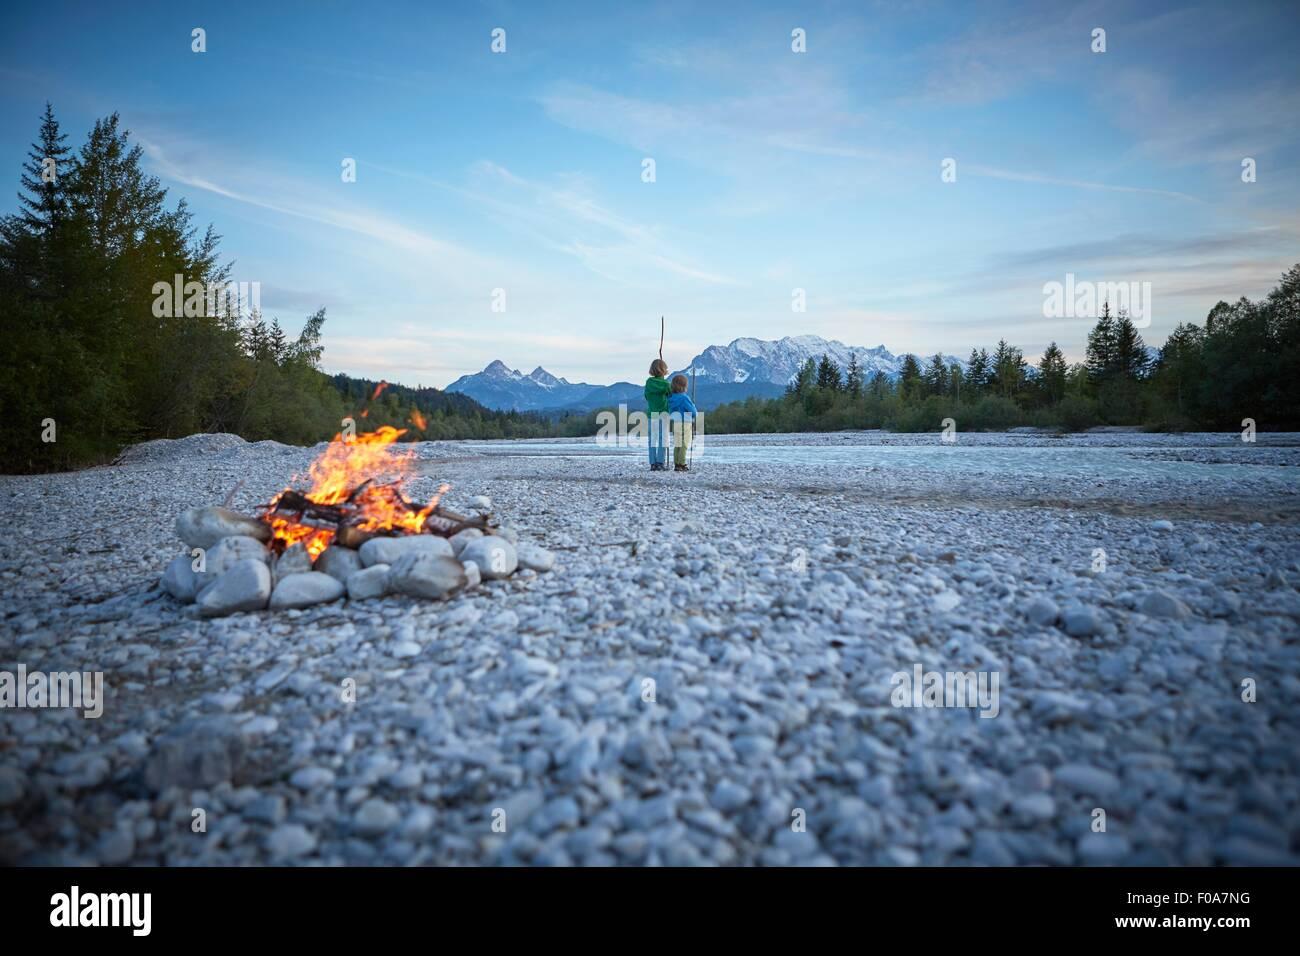 Rear view of boys near campfire holding sticks, Wallgau, Bavaria, Germany - Stock Image